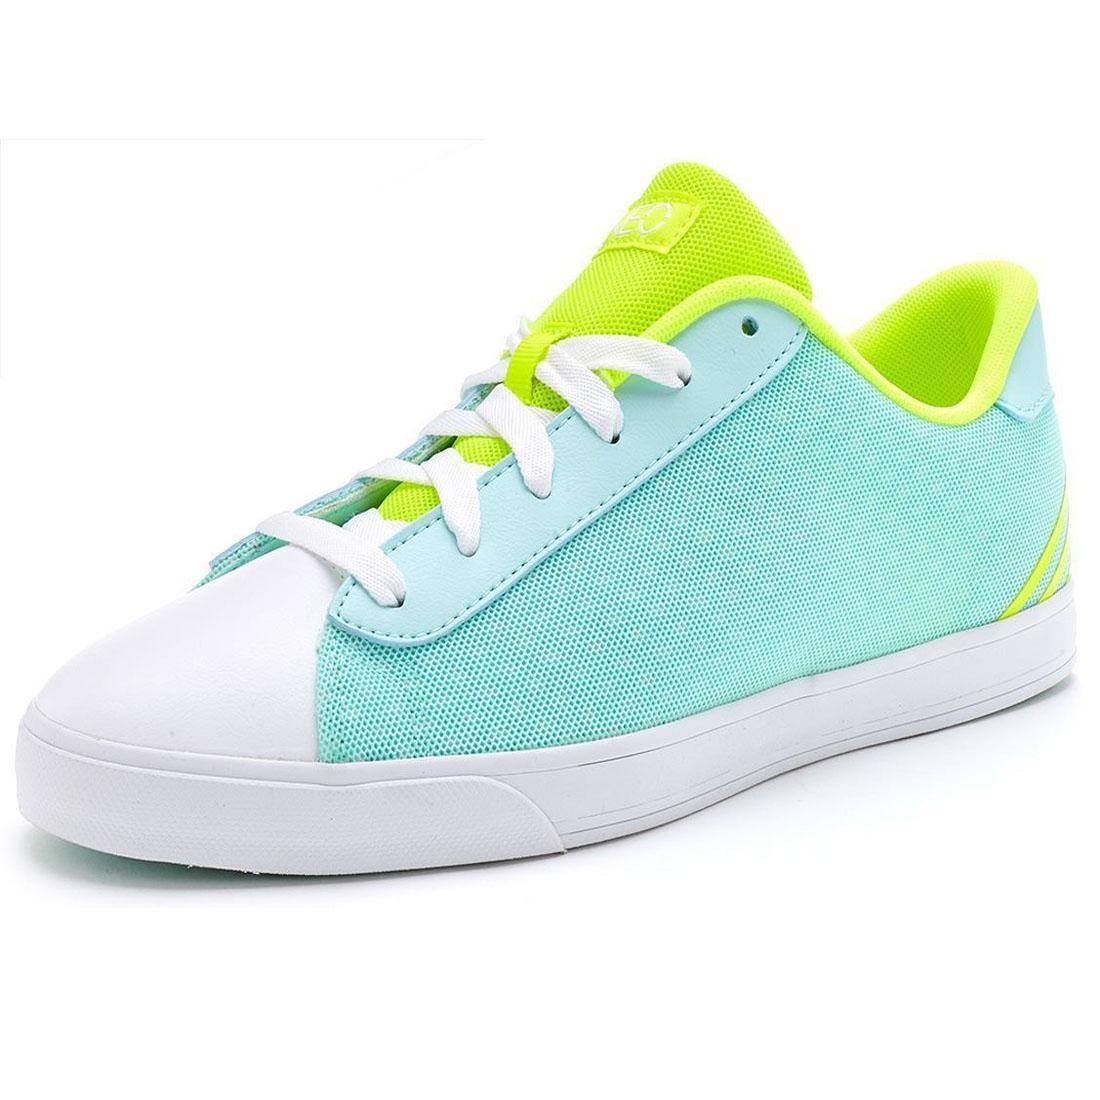 online retailer 80a28 aaa6a ADIDAS NEO da Donna Scarpe da ginnastica gomma punta verde menta Casual  Palestra